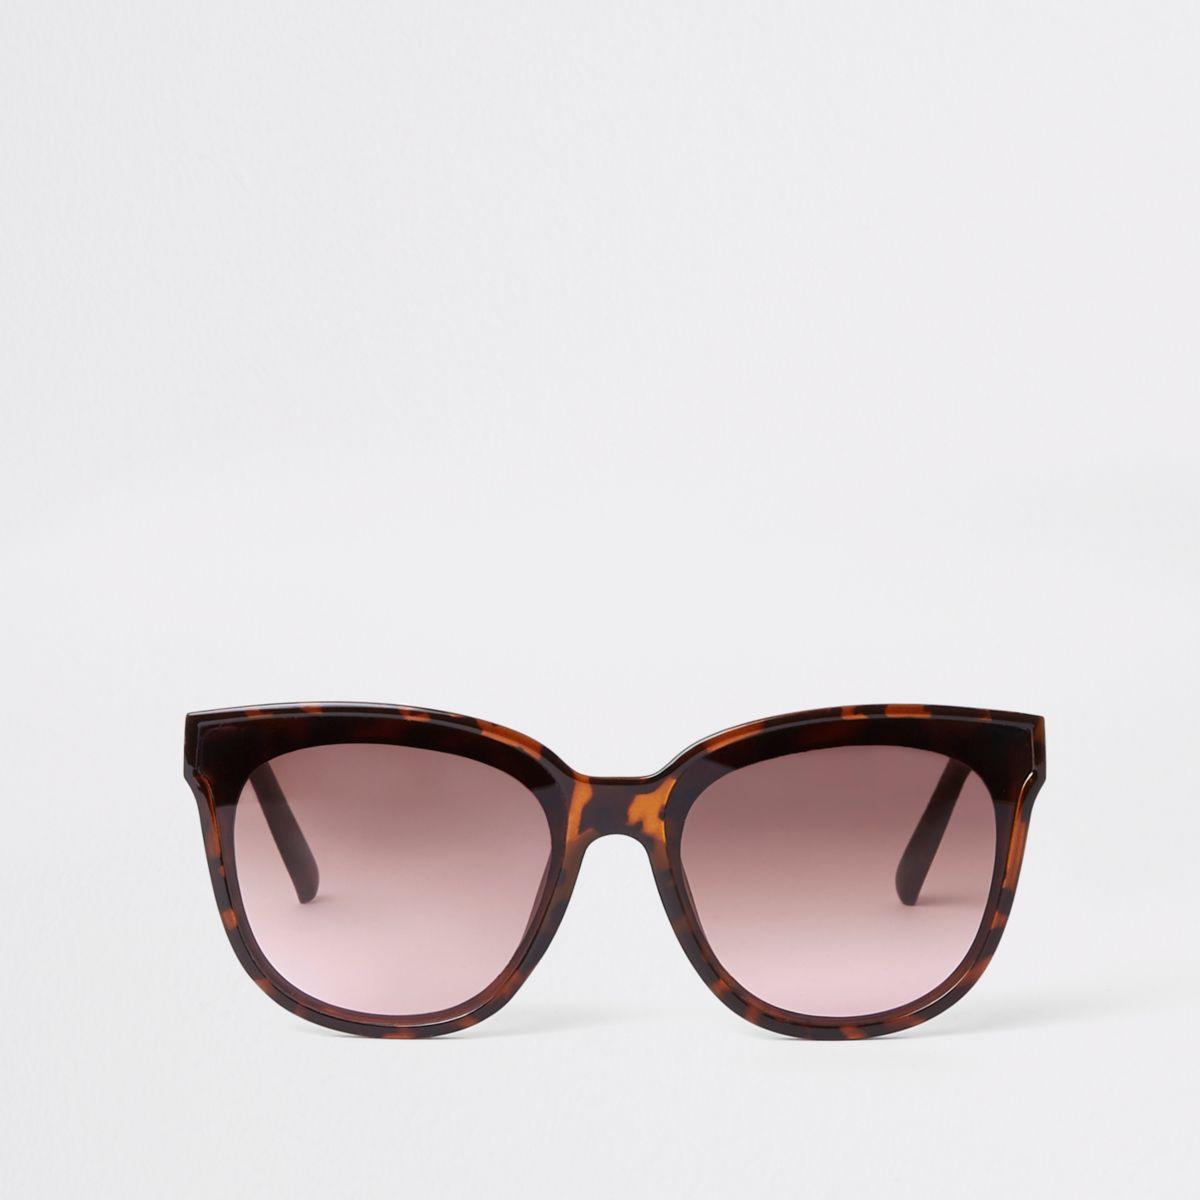 Brown tortoise shell laid on lens sunglasses